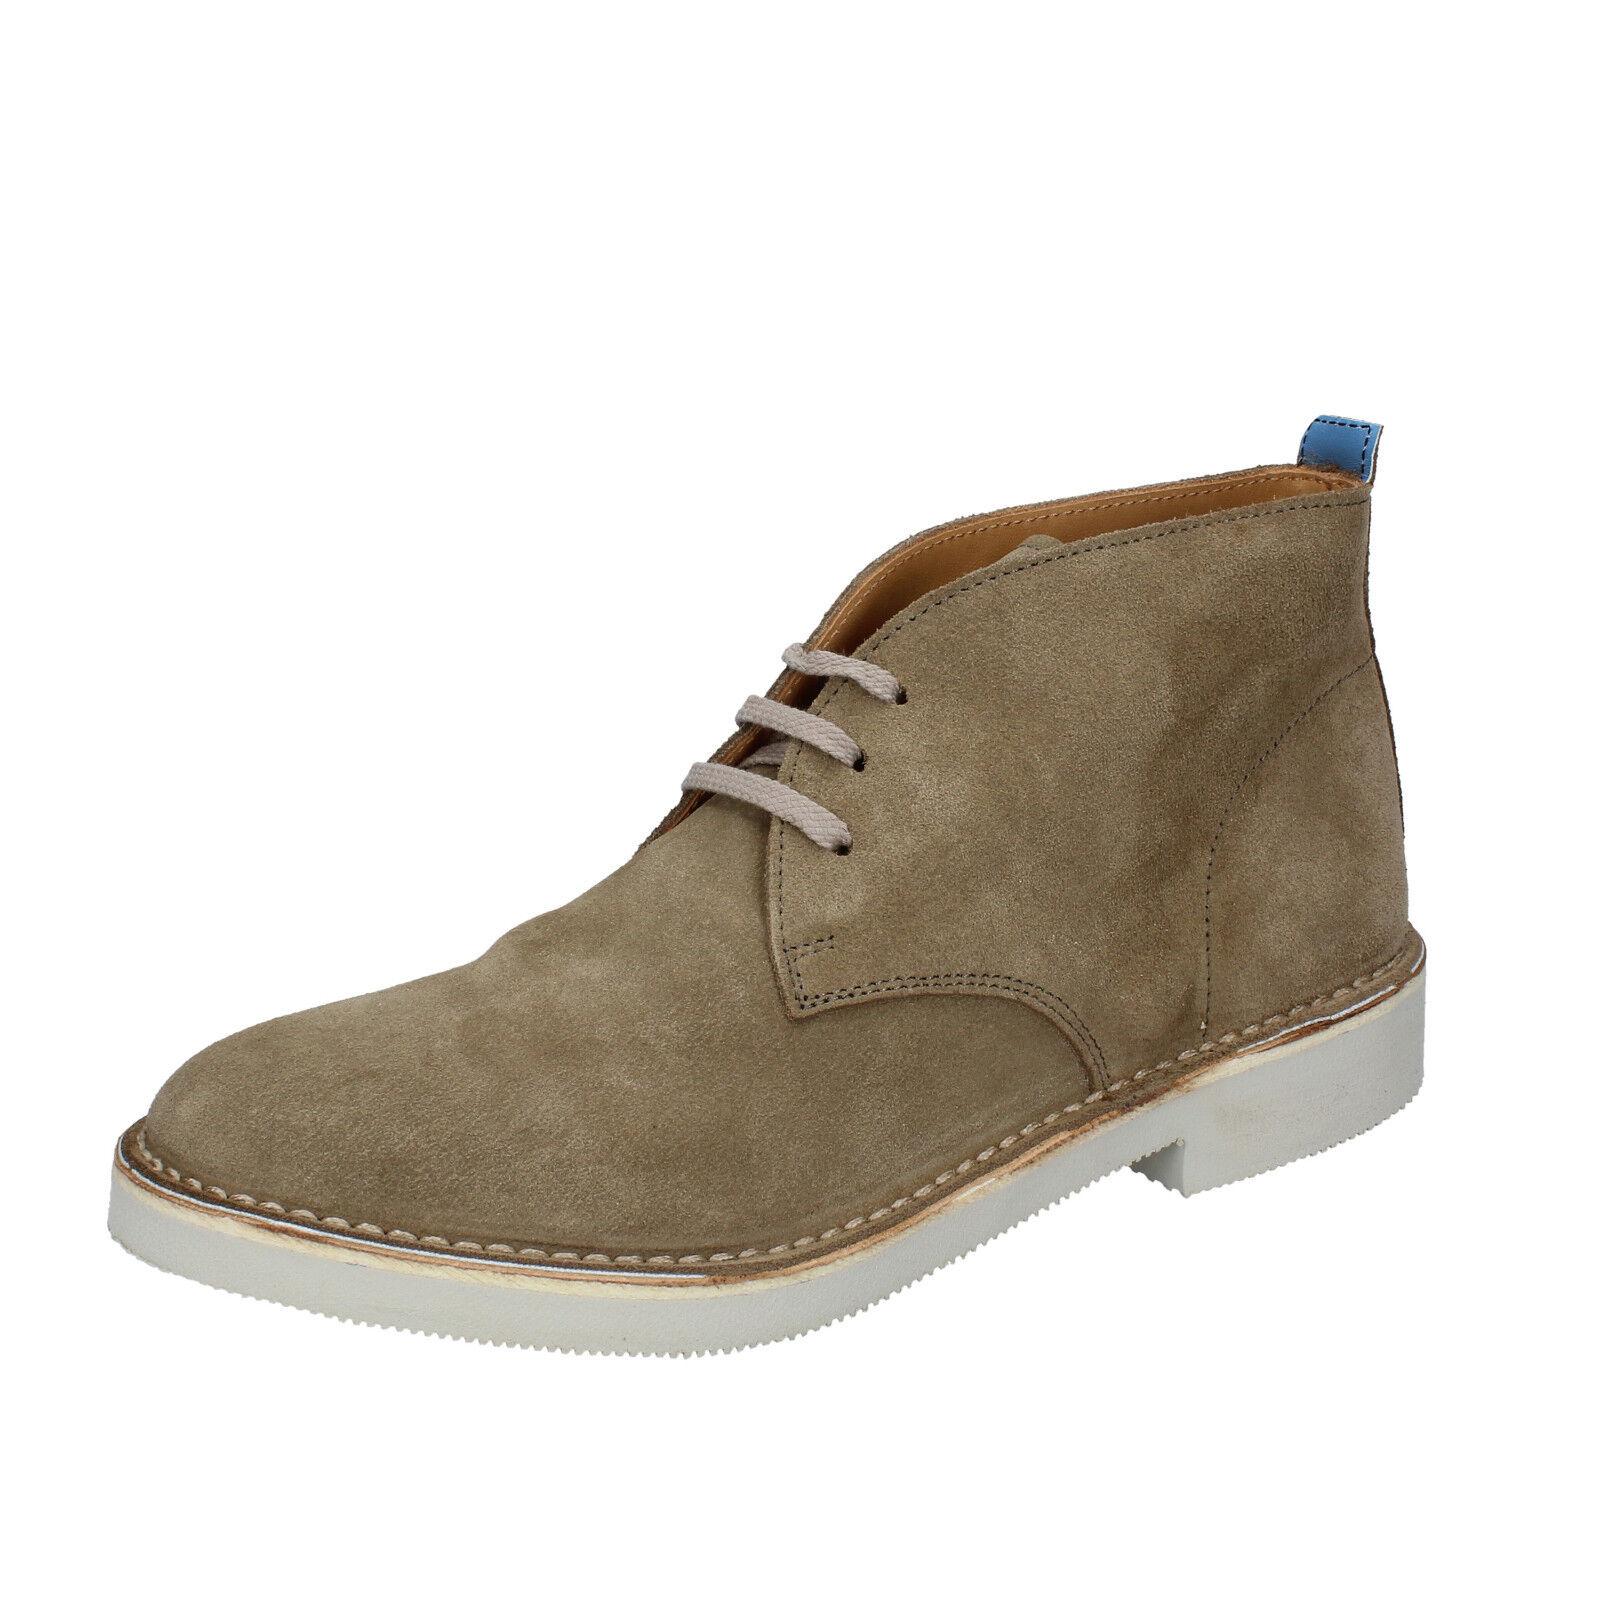 Herren schuhe MOMA 43 EU desert boots Grün wildleder AB428-43